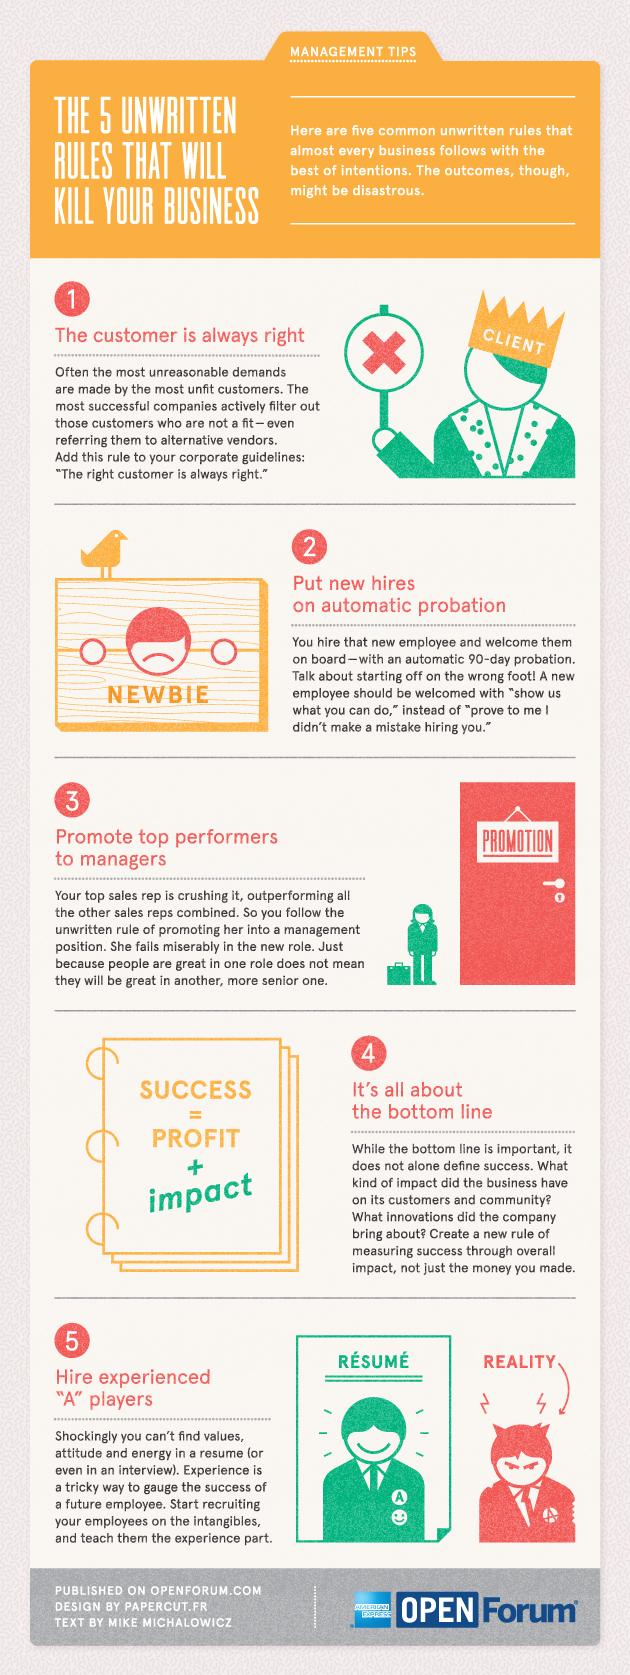 5 Unique Small Business Management Tips for Success